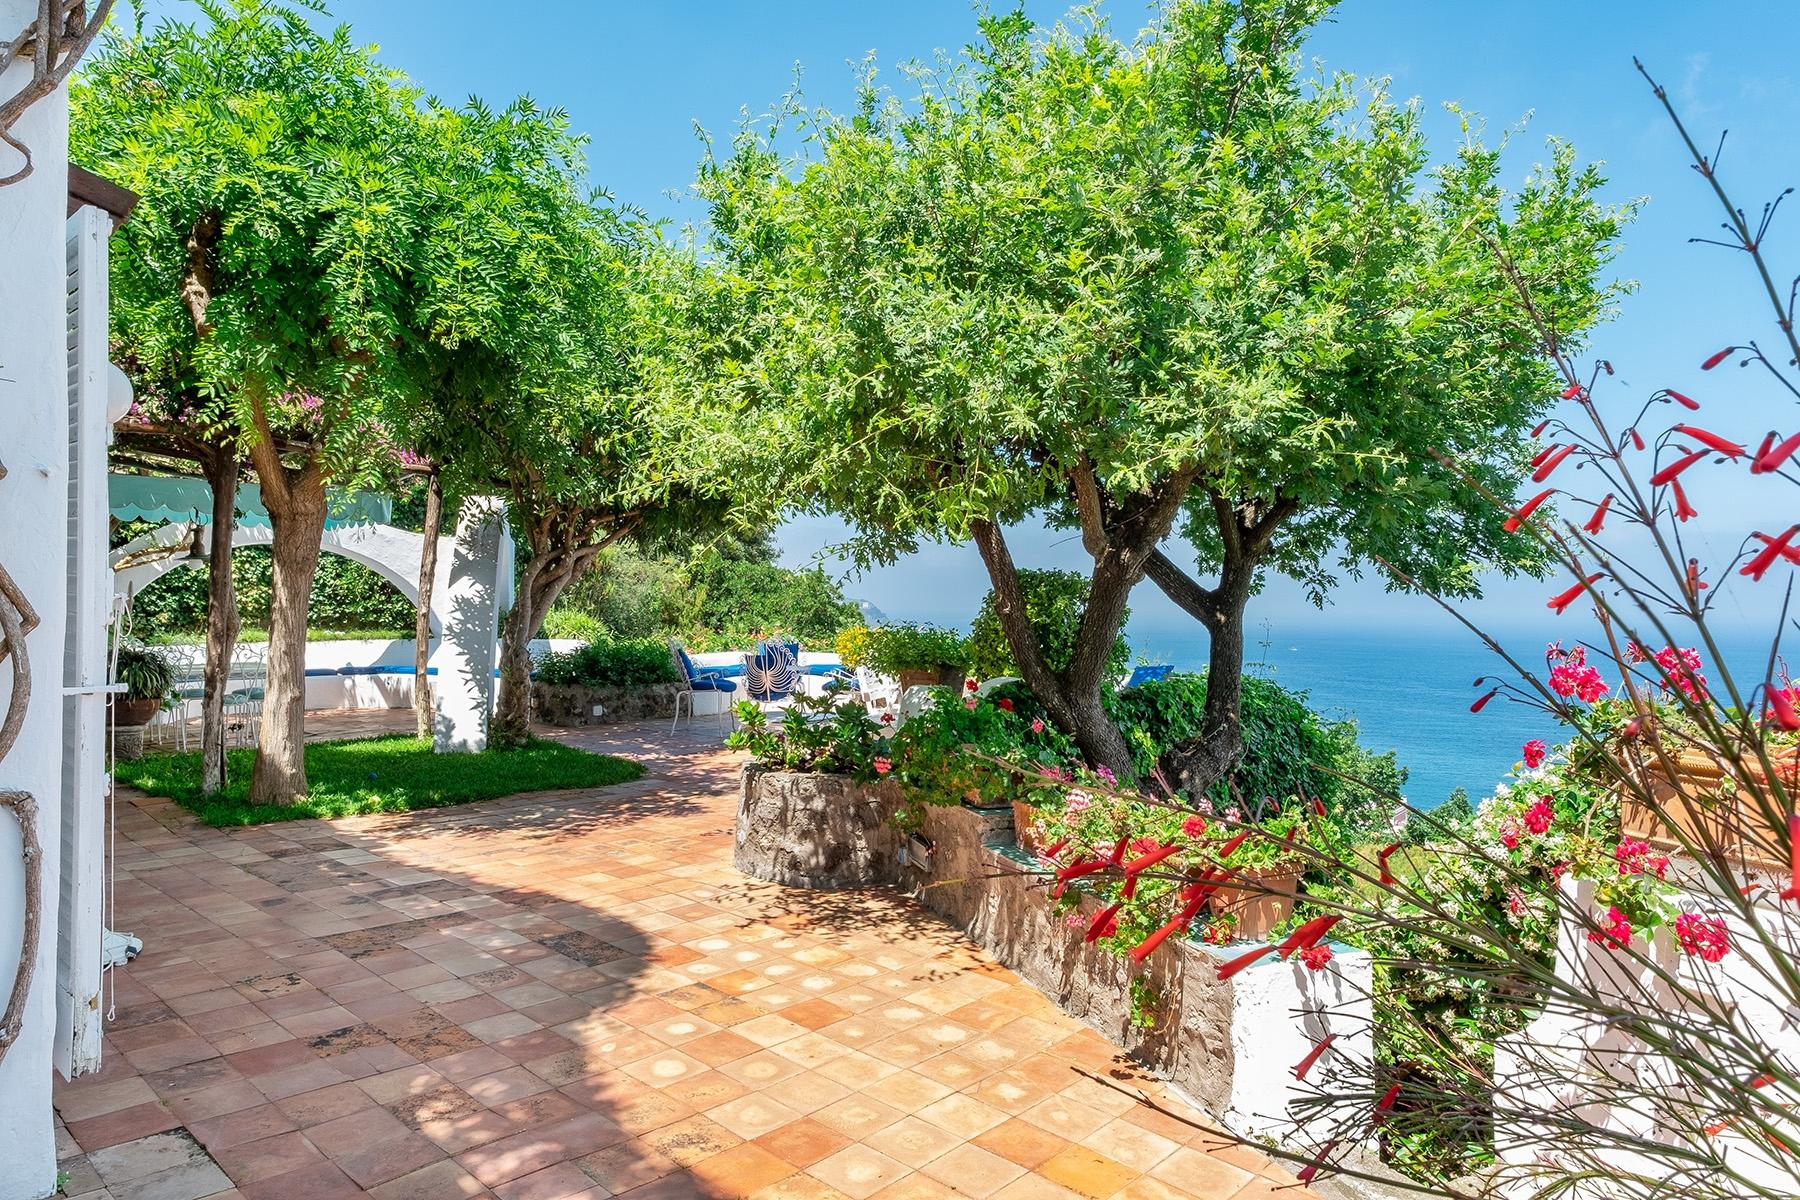 Villa in Vendita a Ischia: 5 locali, 206 mq - Foto 16